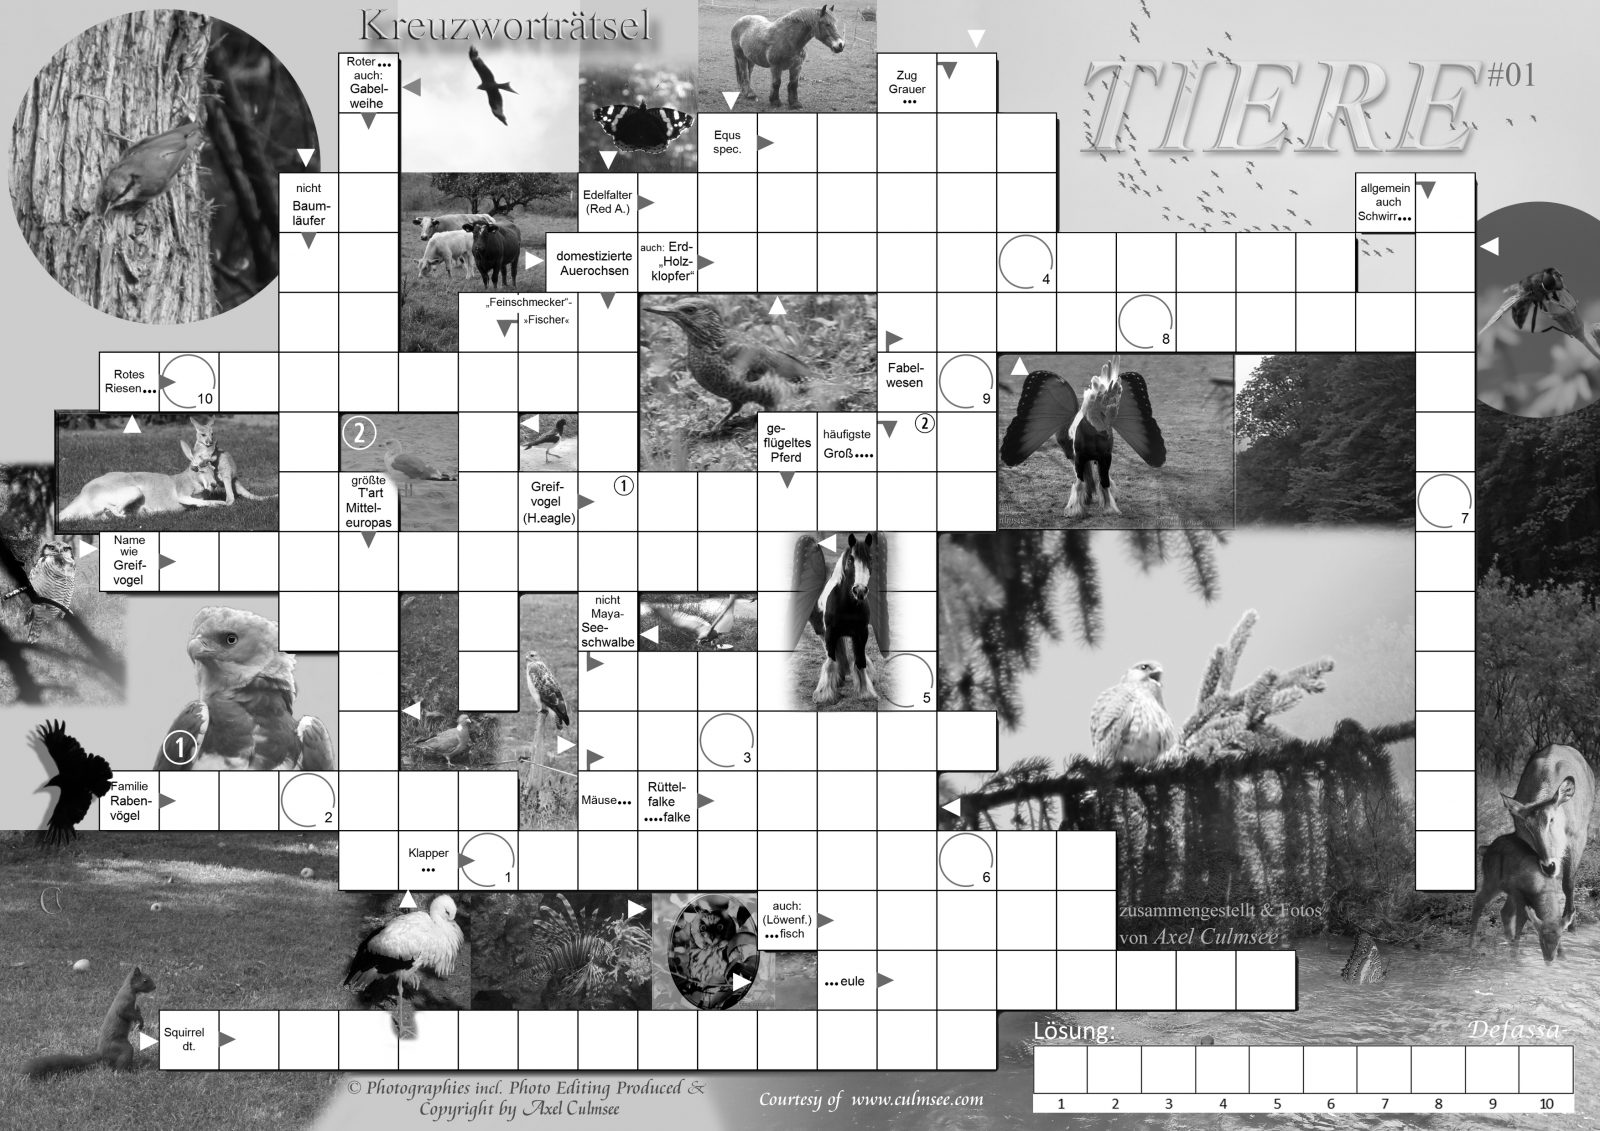 Tiere 01 crossword photos (C) Axel Culmsee